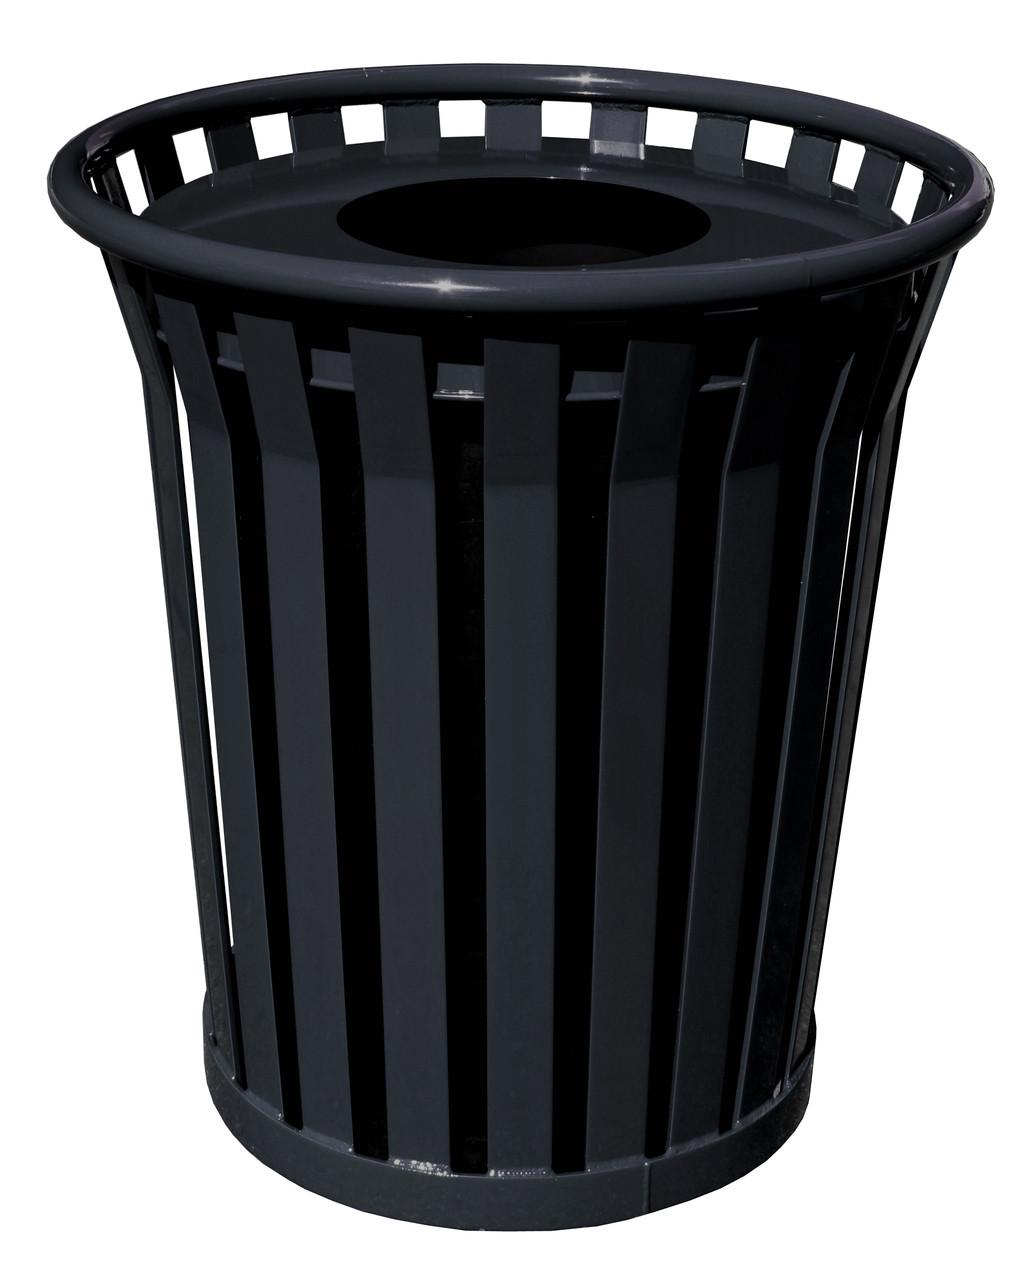 Witt 36 Gallon WC3600-FT-BK Outdoor Waste Receptacle Black